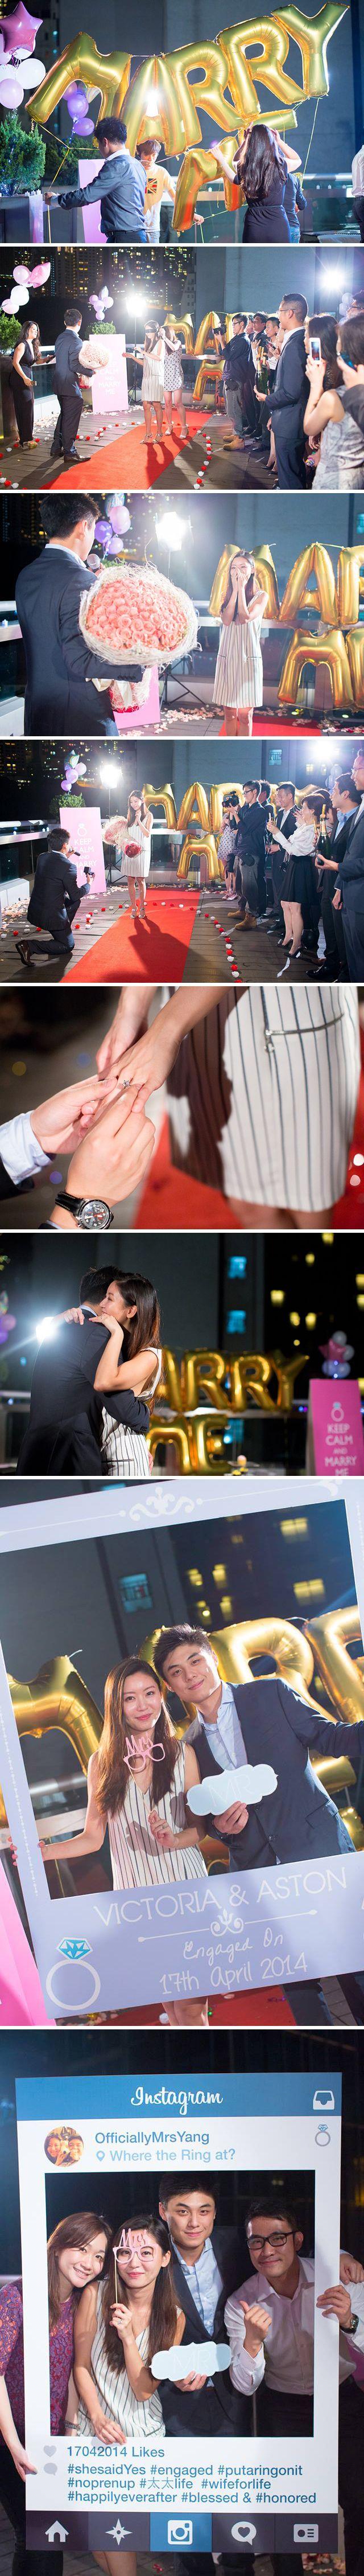 Surprise proposal at a rooftop bar in Hong Kong // Proposal inspiration